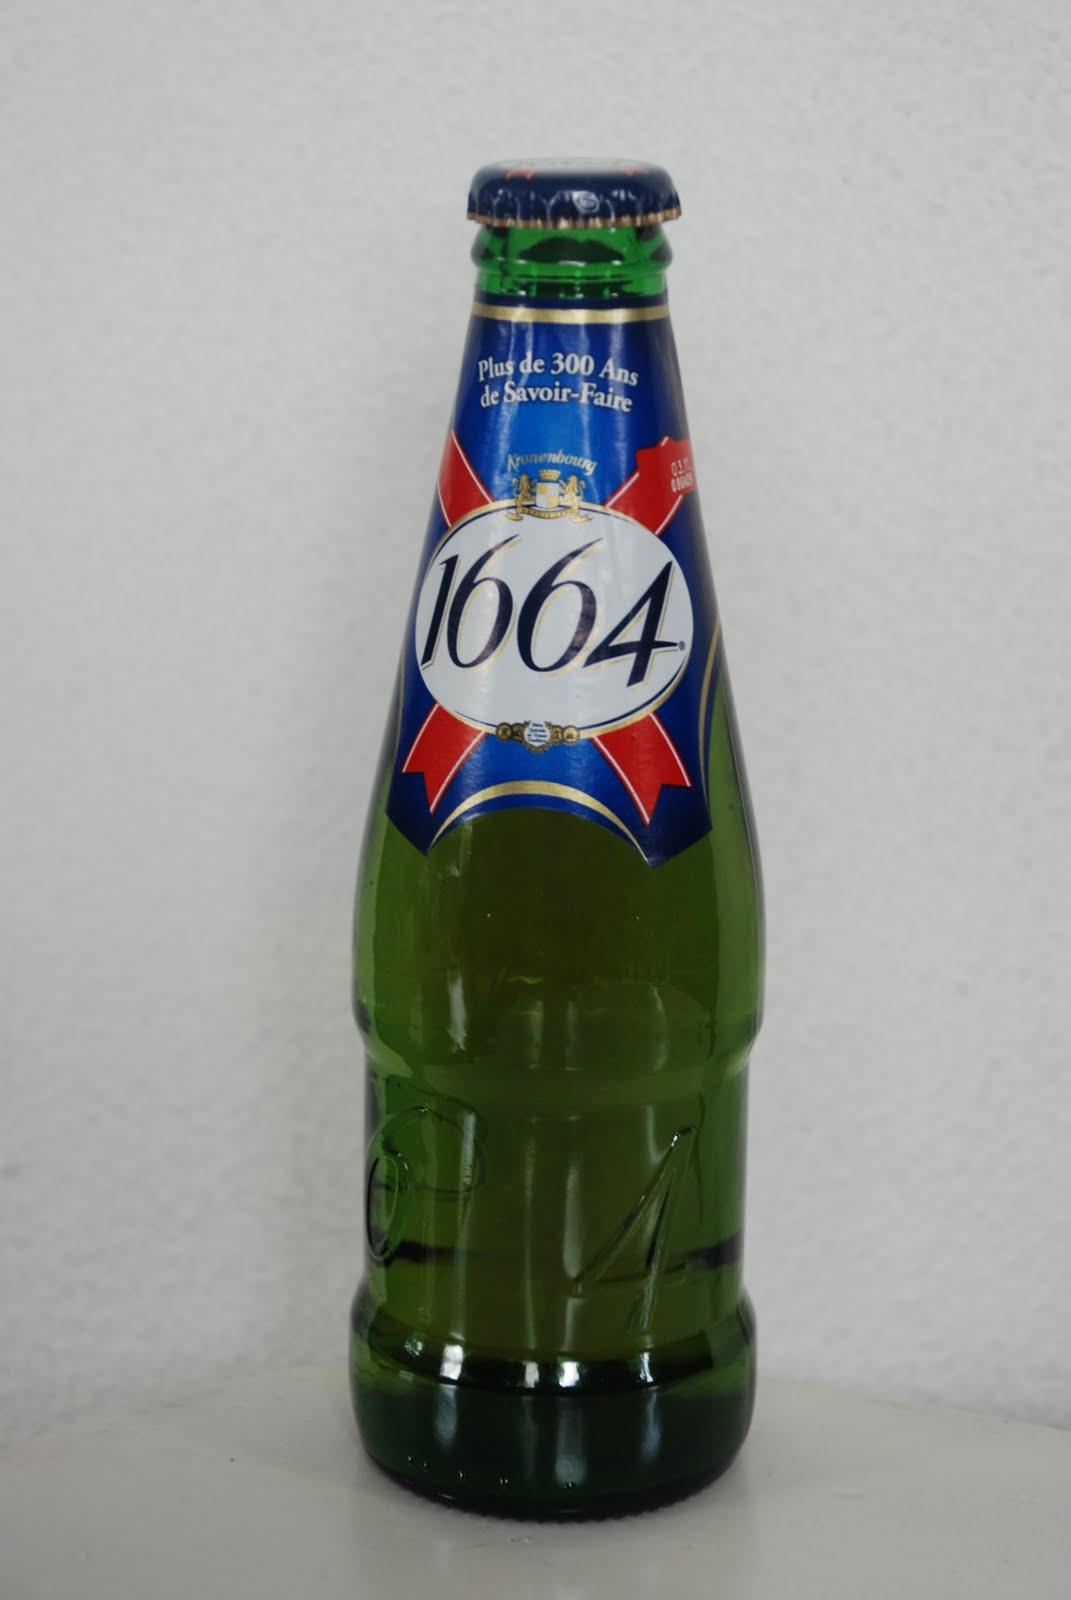 1fd4327f 1664 har en grei Farge og har en kosefaktor på 5,5%. Det er lite lukt på  dette ølet, og om smaken kan vi si at dette er et massedrikkeøl.